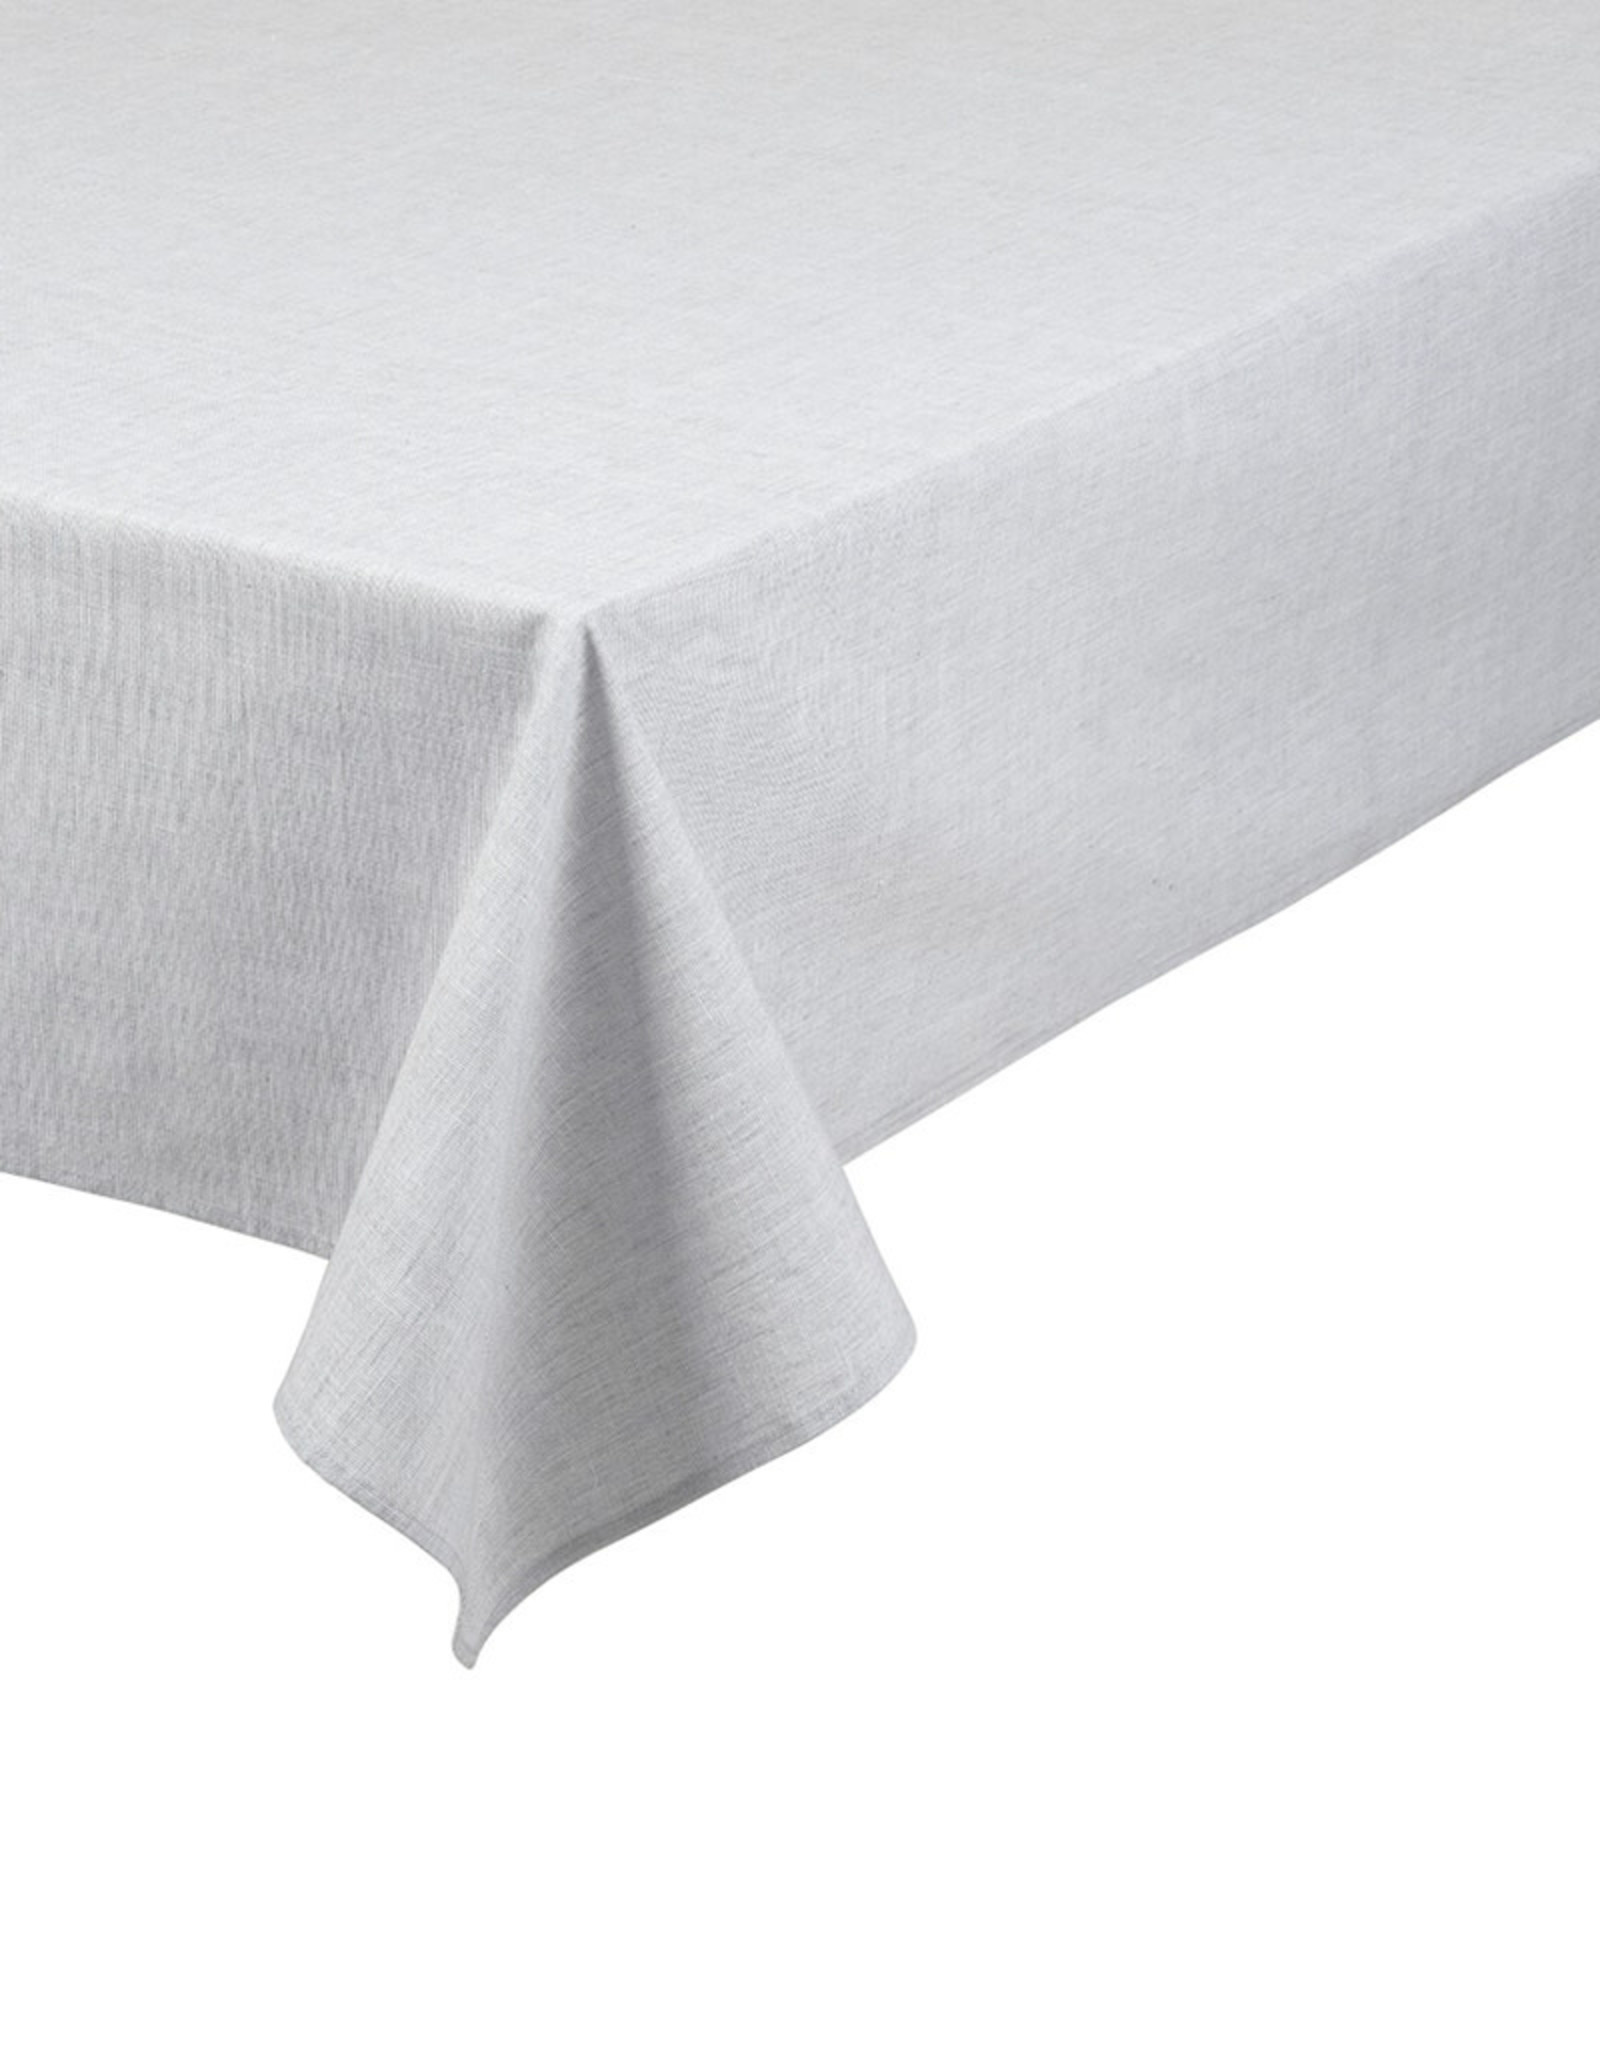 BLOMUS BLOMUS MESA TABLE CLOTH ELEPHANT SKIN 140x220